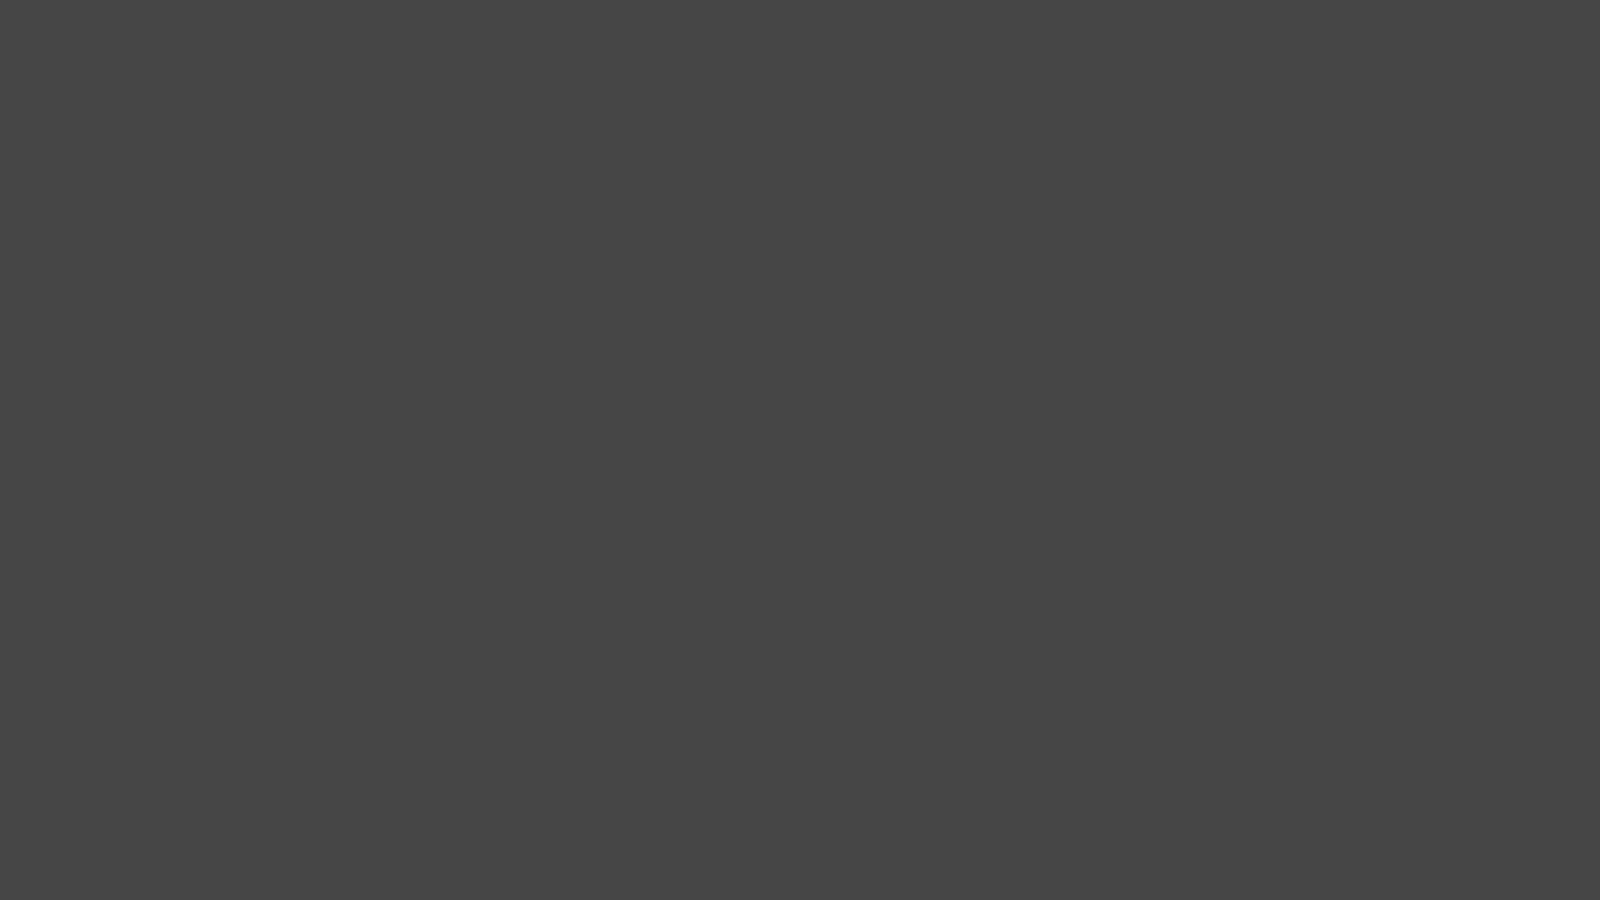 NetScore Grey Background